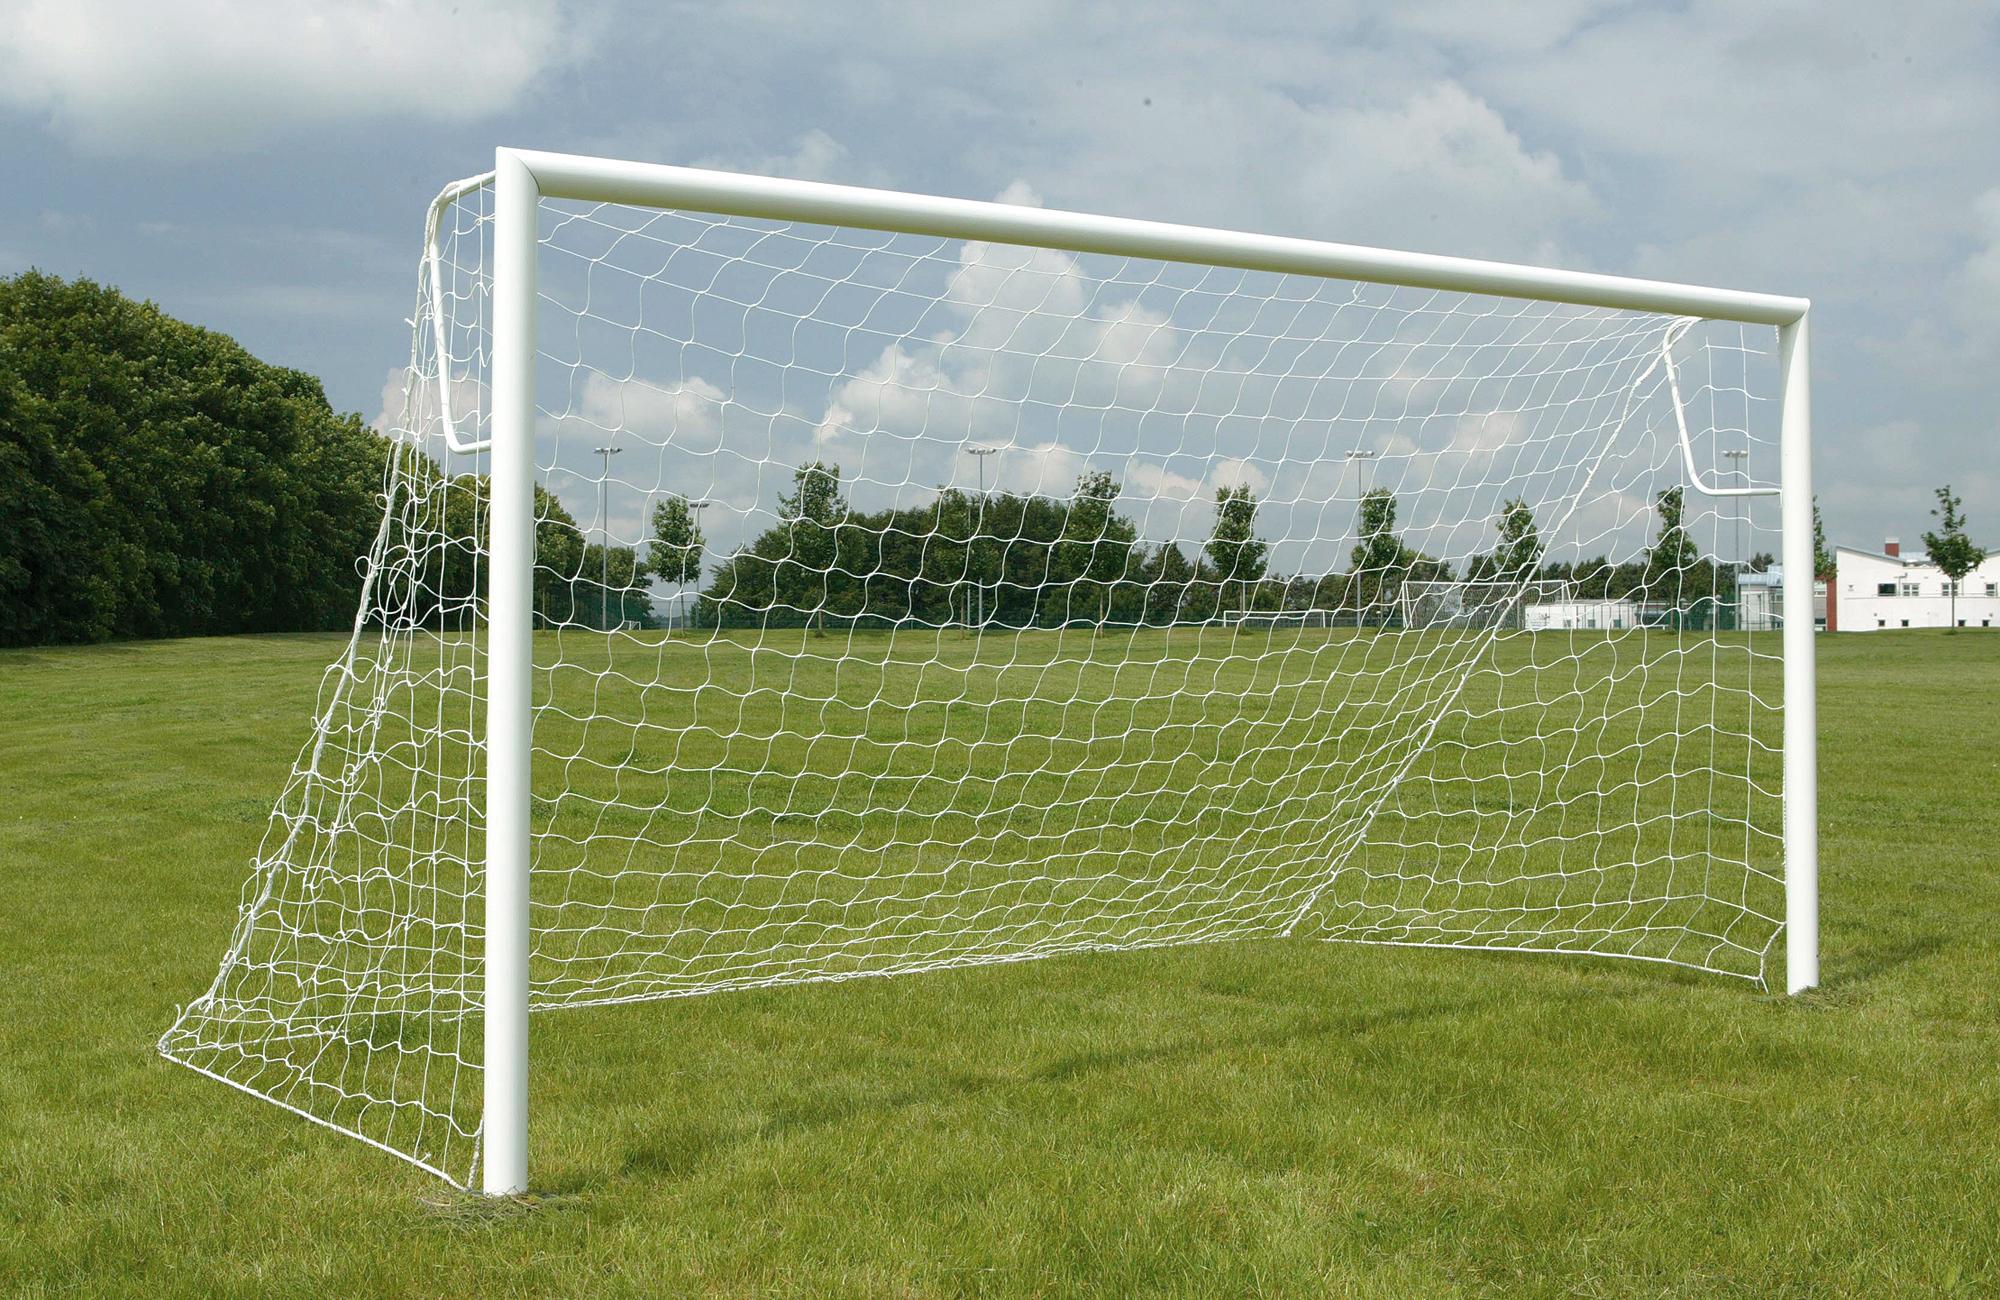 80mm Aluminium Socketed Football Goal Posts - 16' x 6'